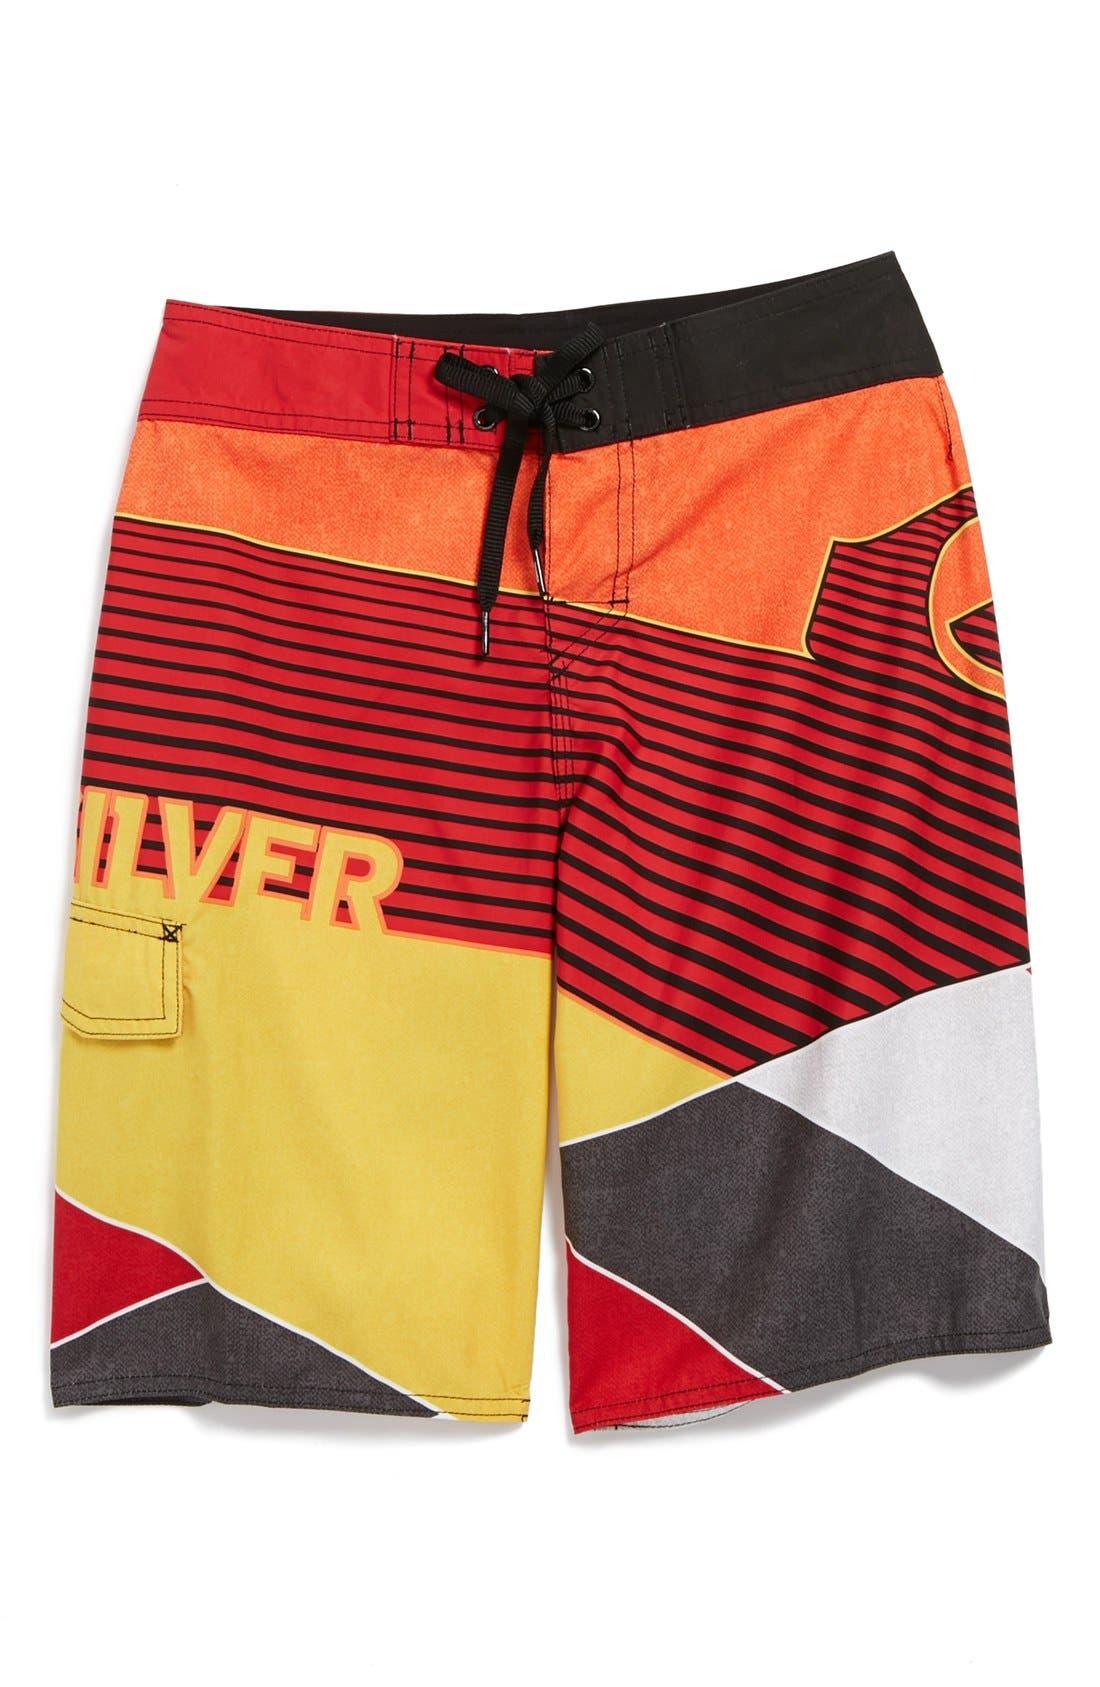 Main Image - Quiksilver 'Beach Day' Board Shorts (Little Boys)